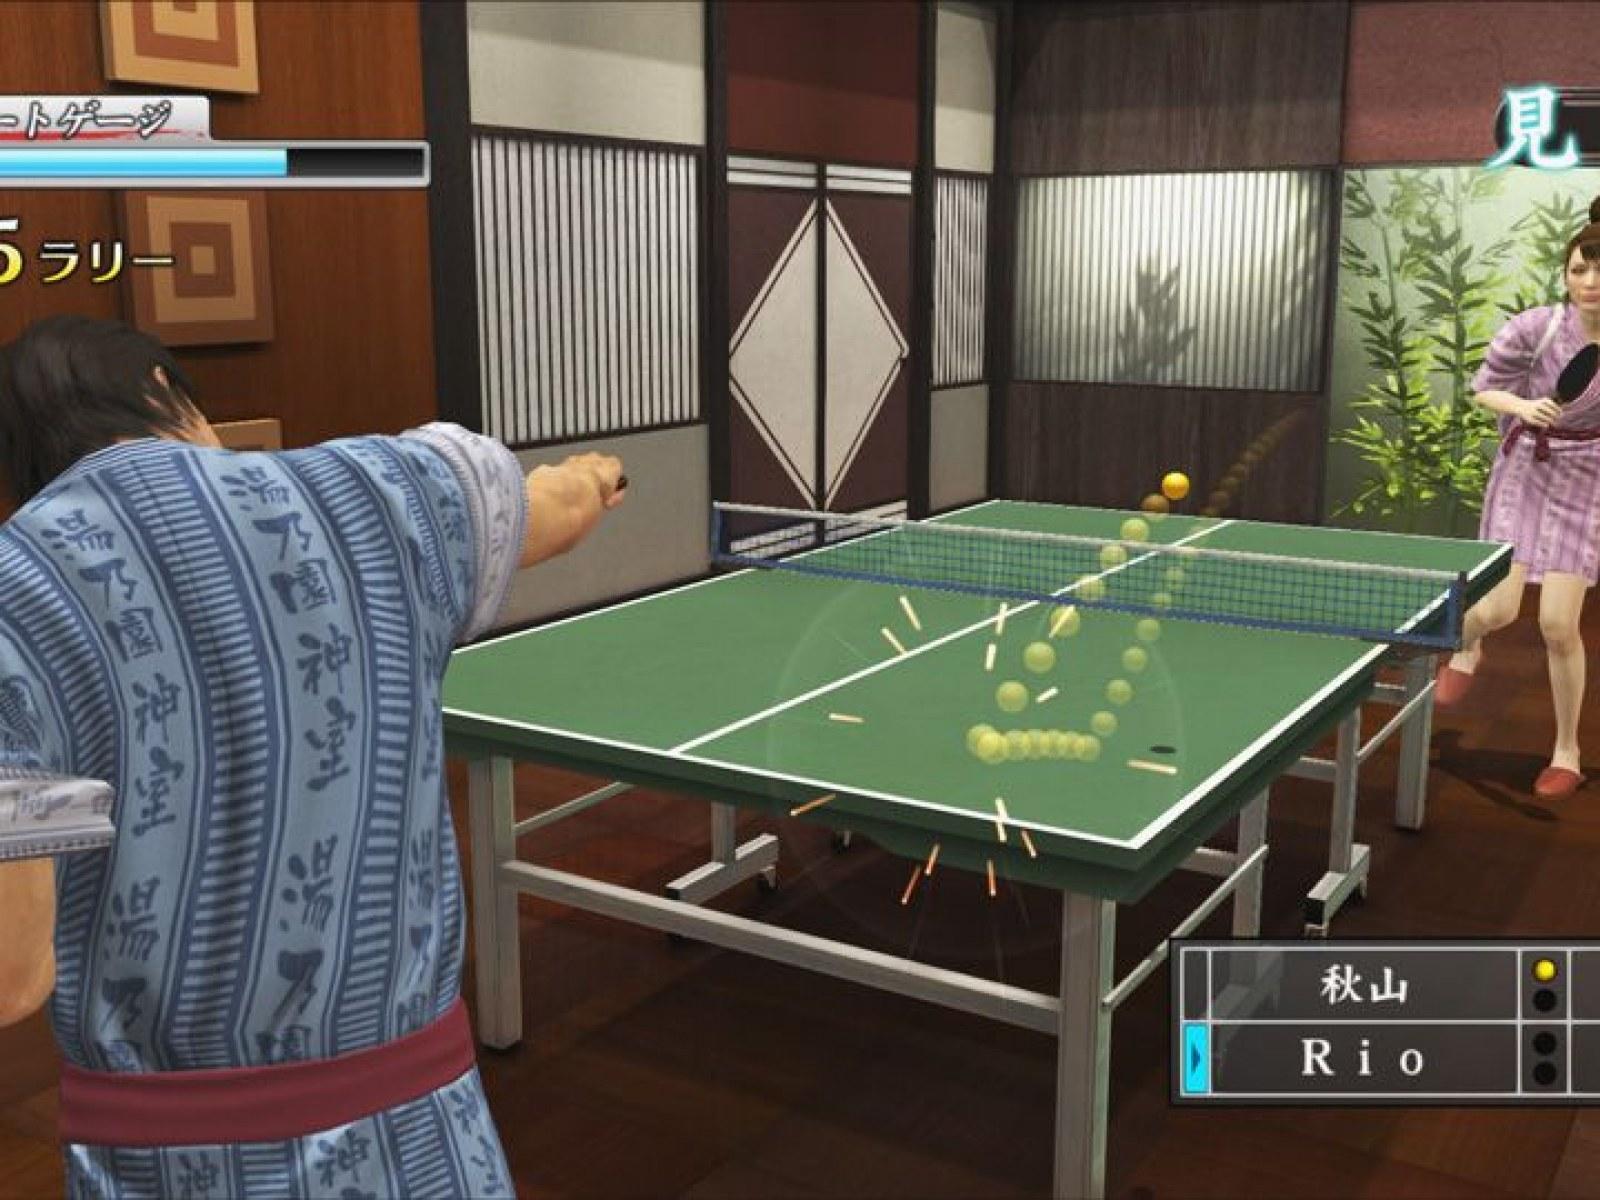 Yakuza 4' Serves Up a Ramen Shop Shootout, Onsen Minigame and Ping Pong